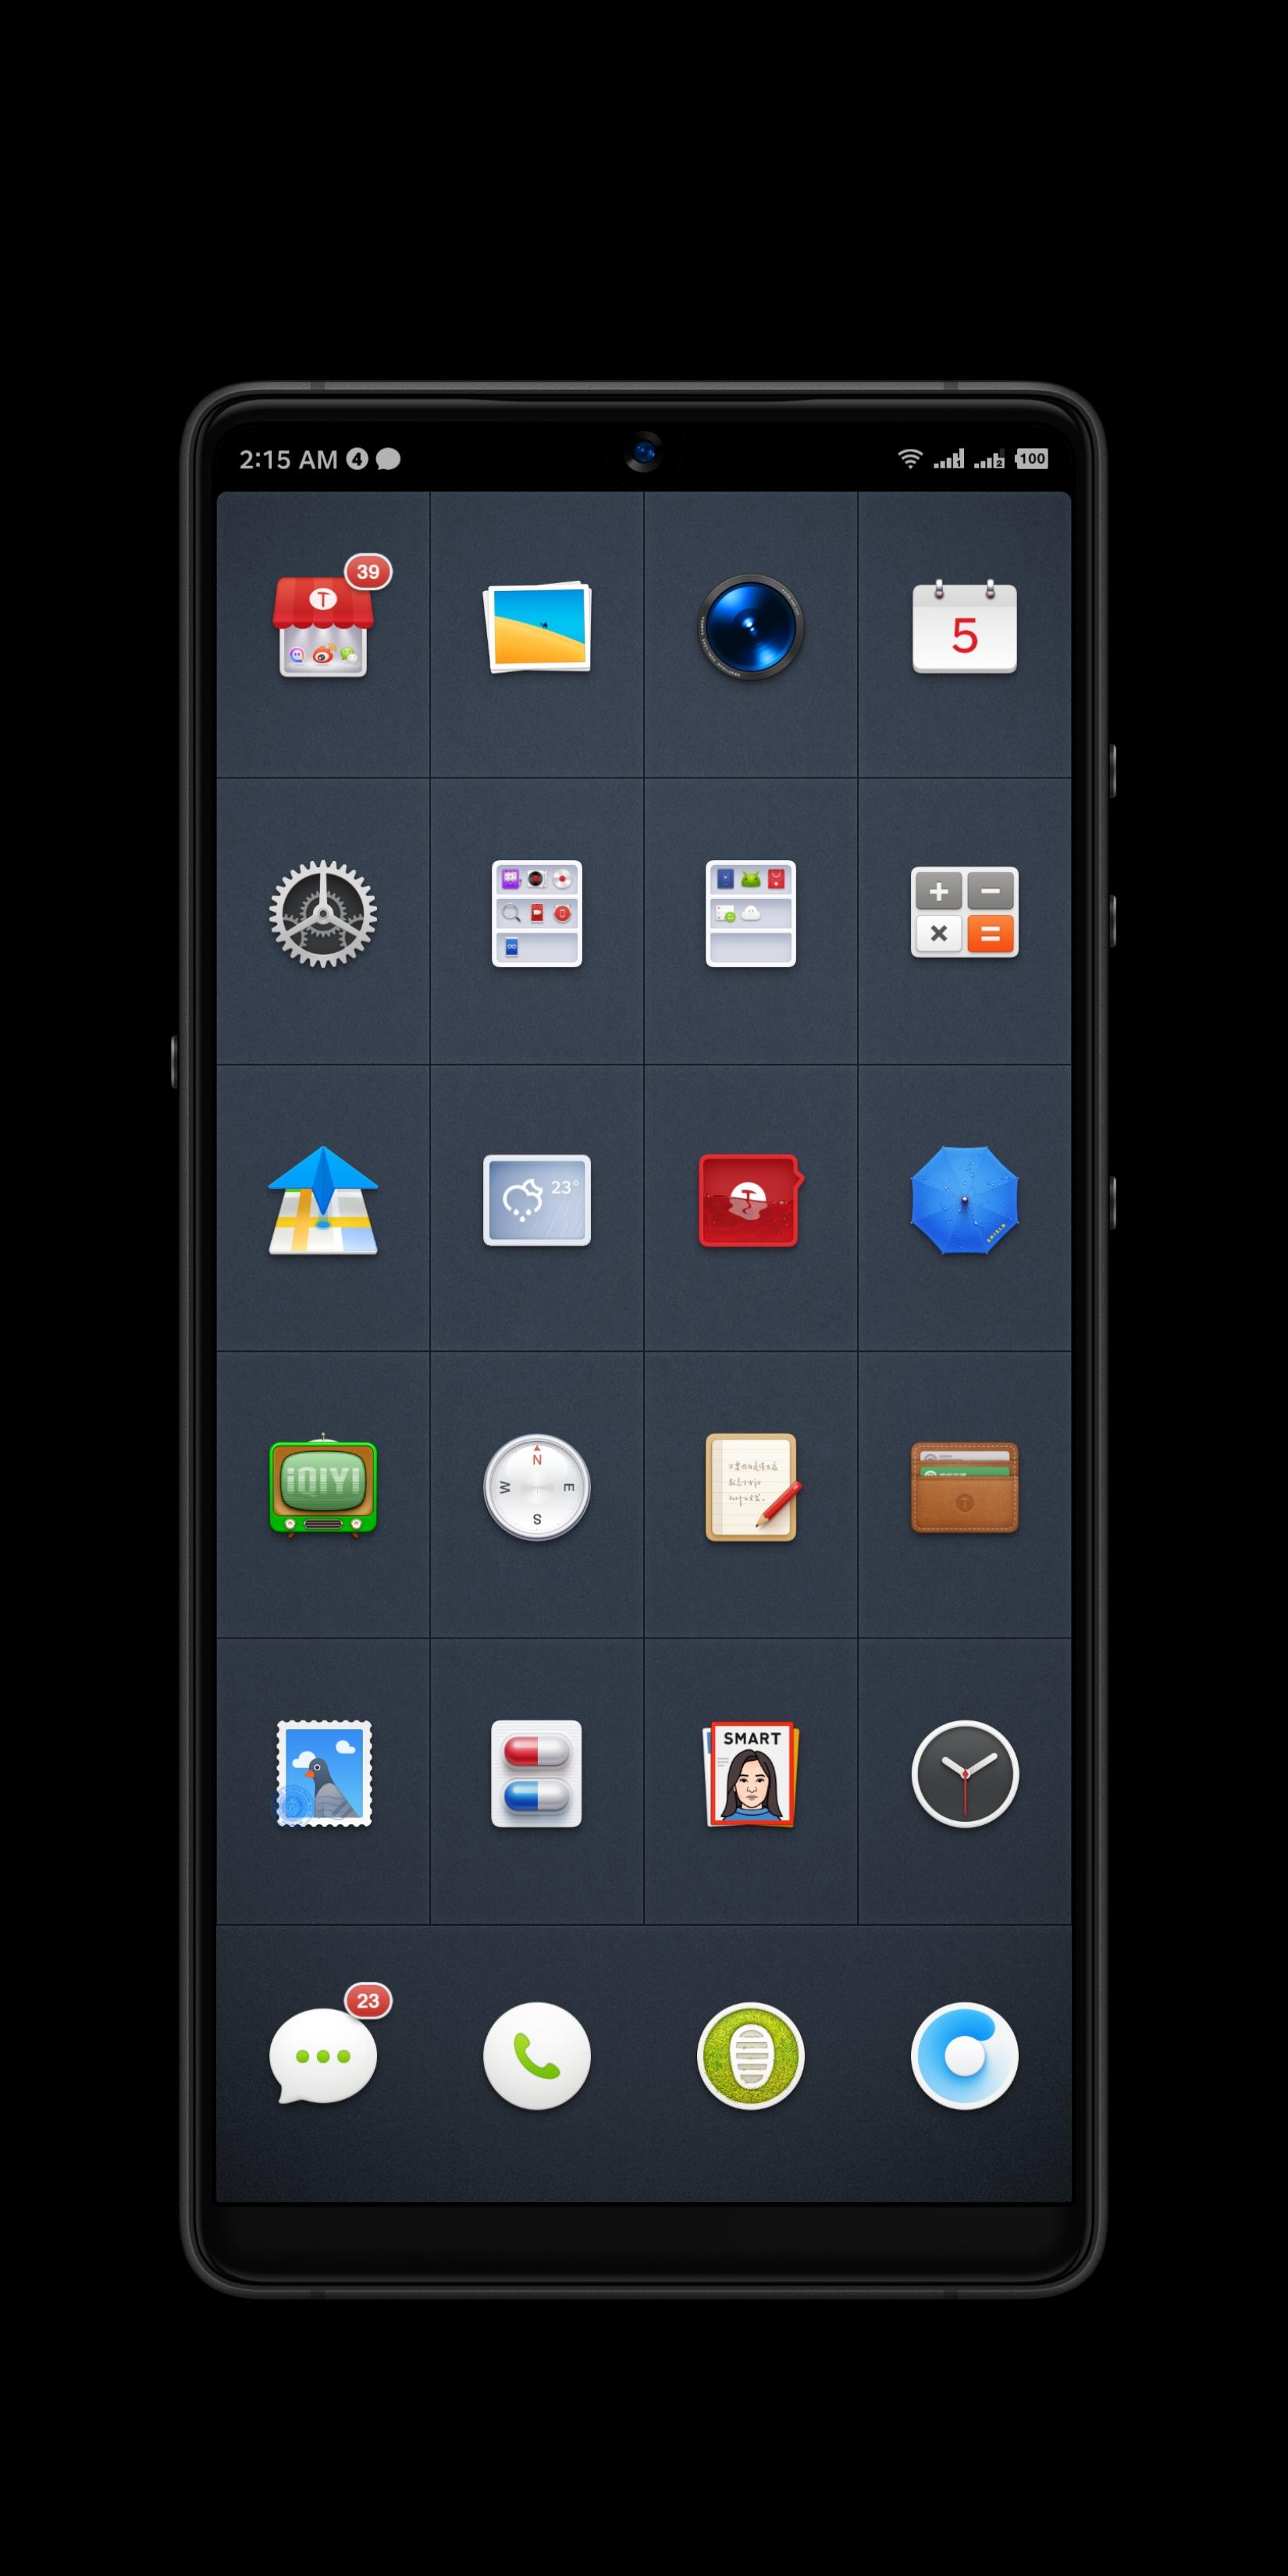 Screenshot_2020-07-05-02-16-06-554_??.png